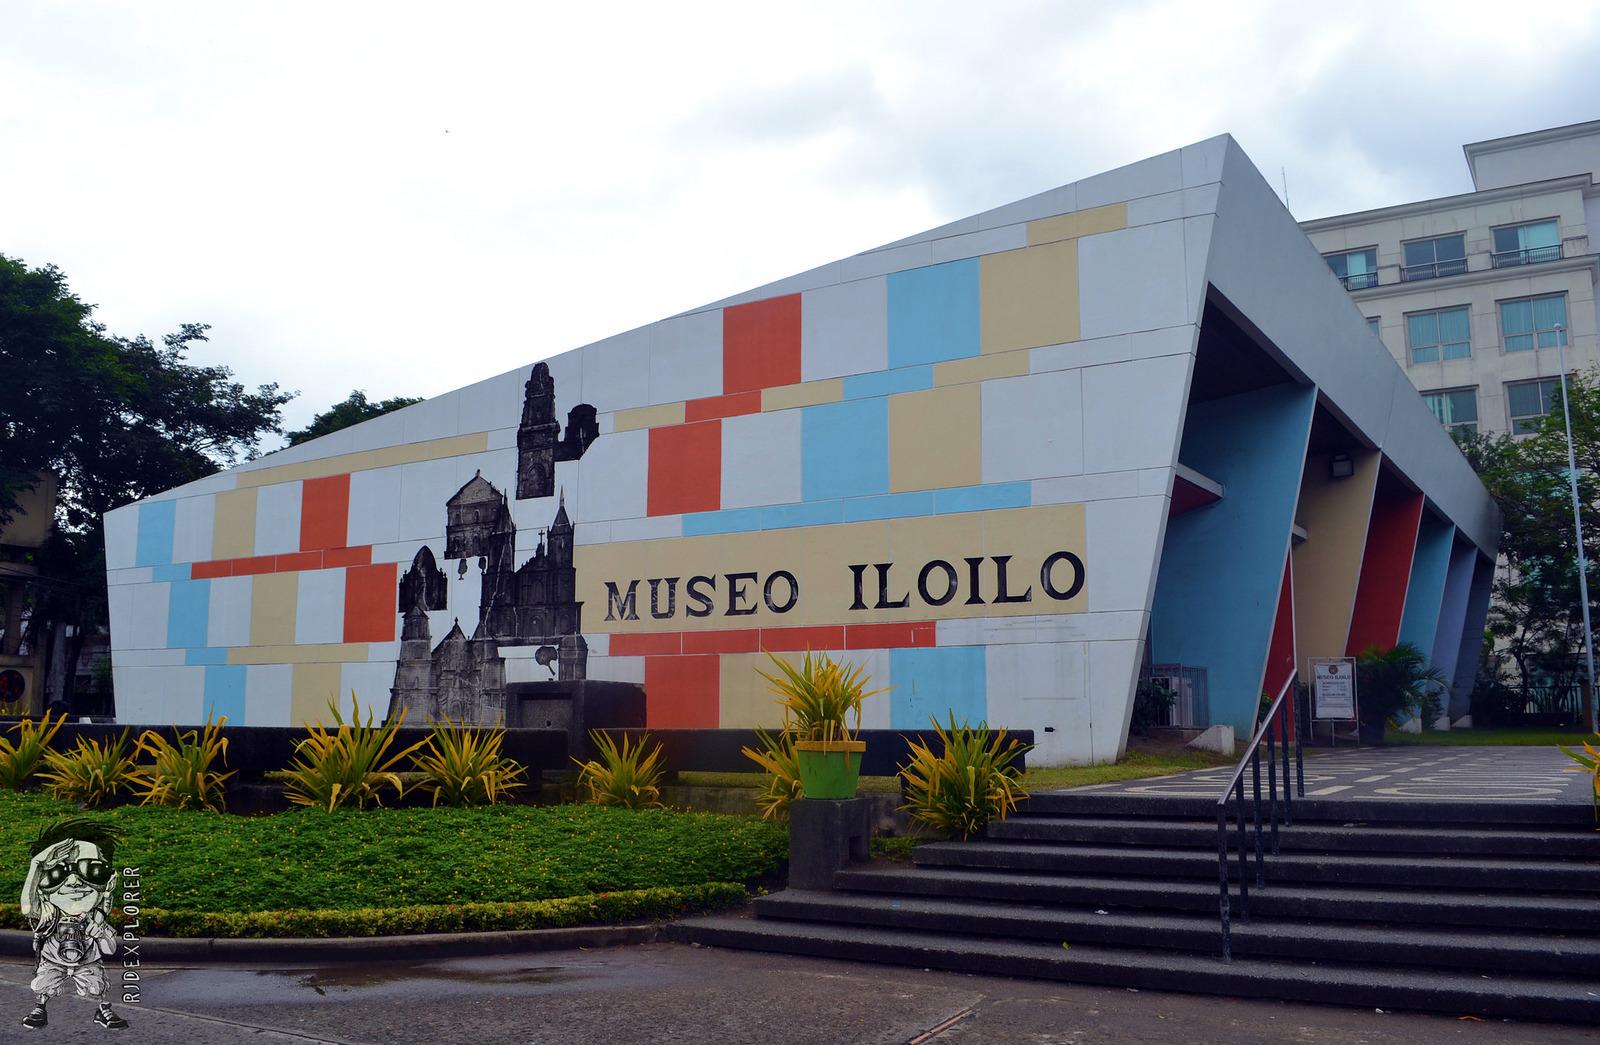 Museo Iloilo: The Ilonggo-Bisaya Culture - iWander